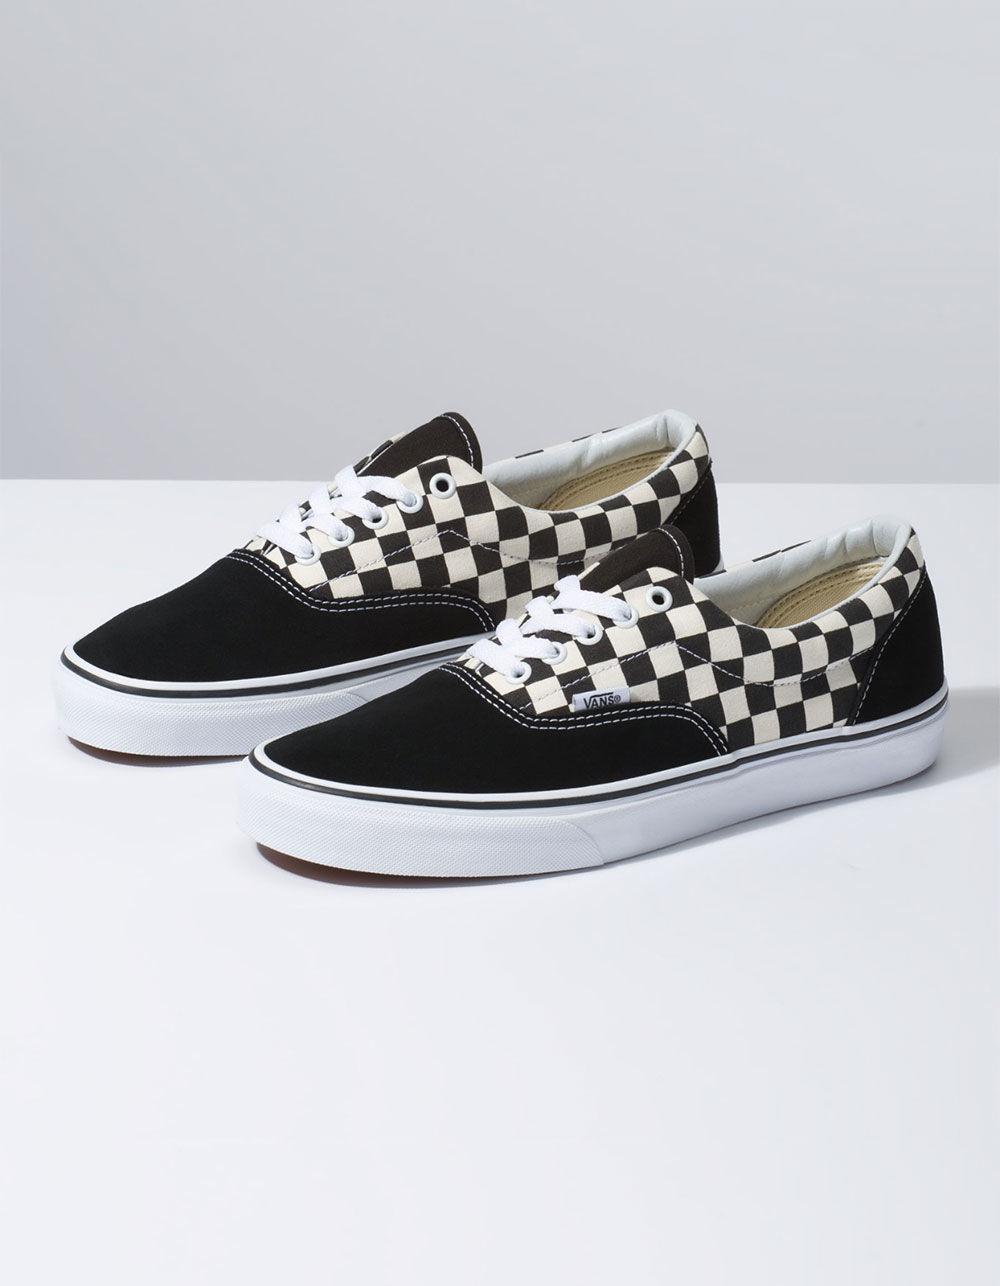 91cd77725cf Vans Primary Check Era Black & White Shoes in Black - Lyst